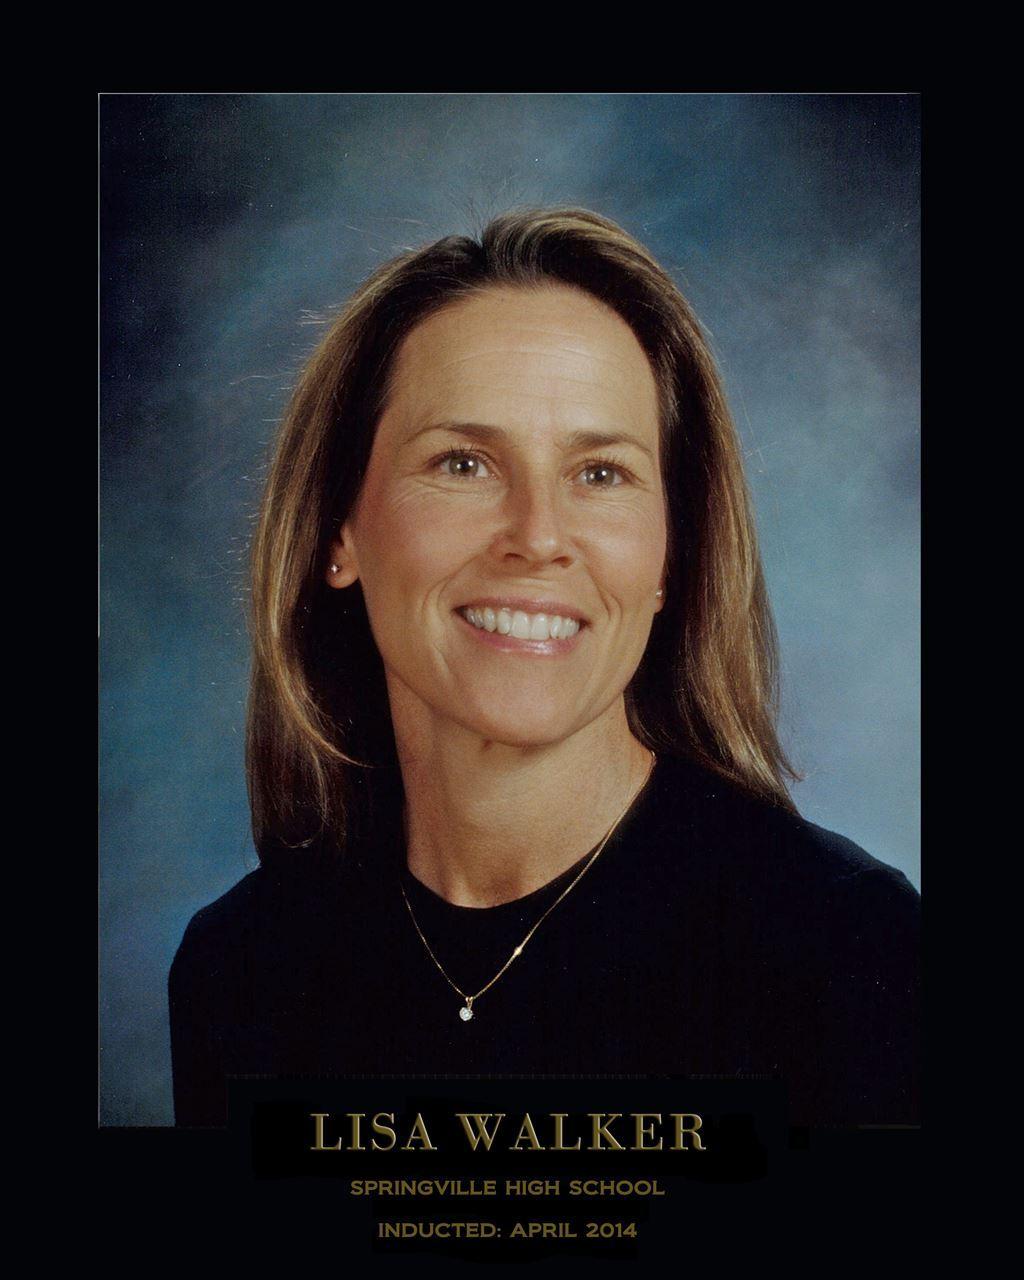 Lisa Walker, 2014